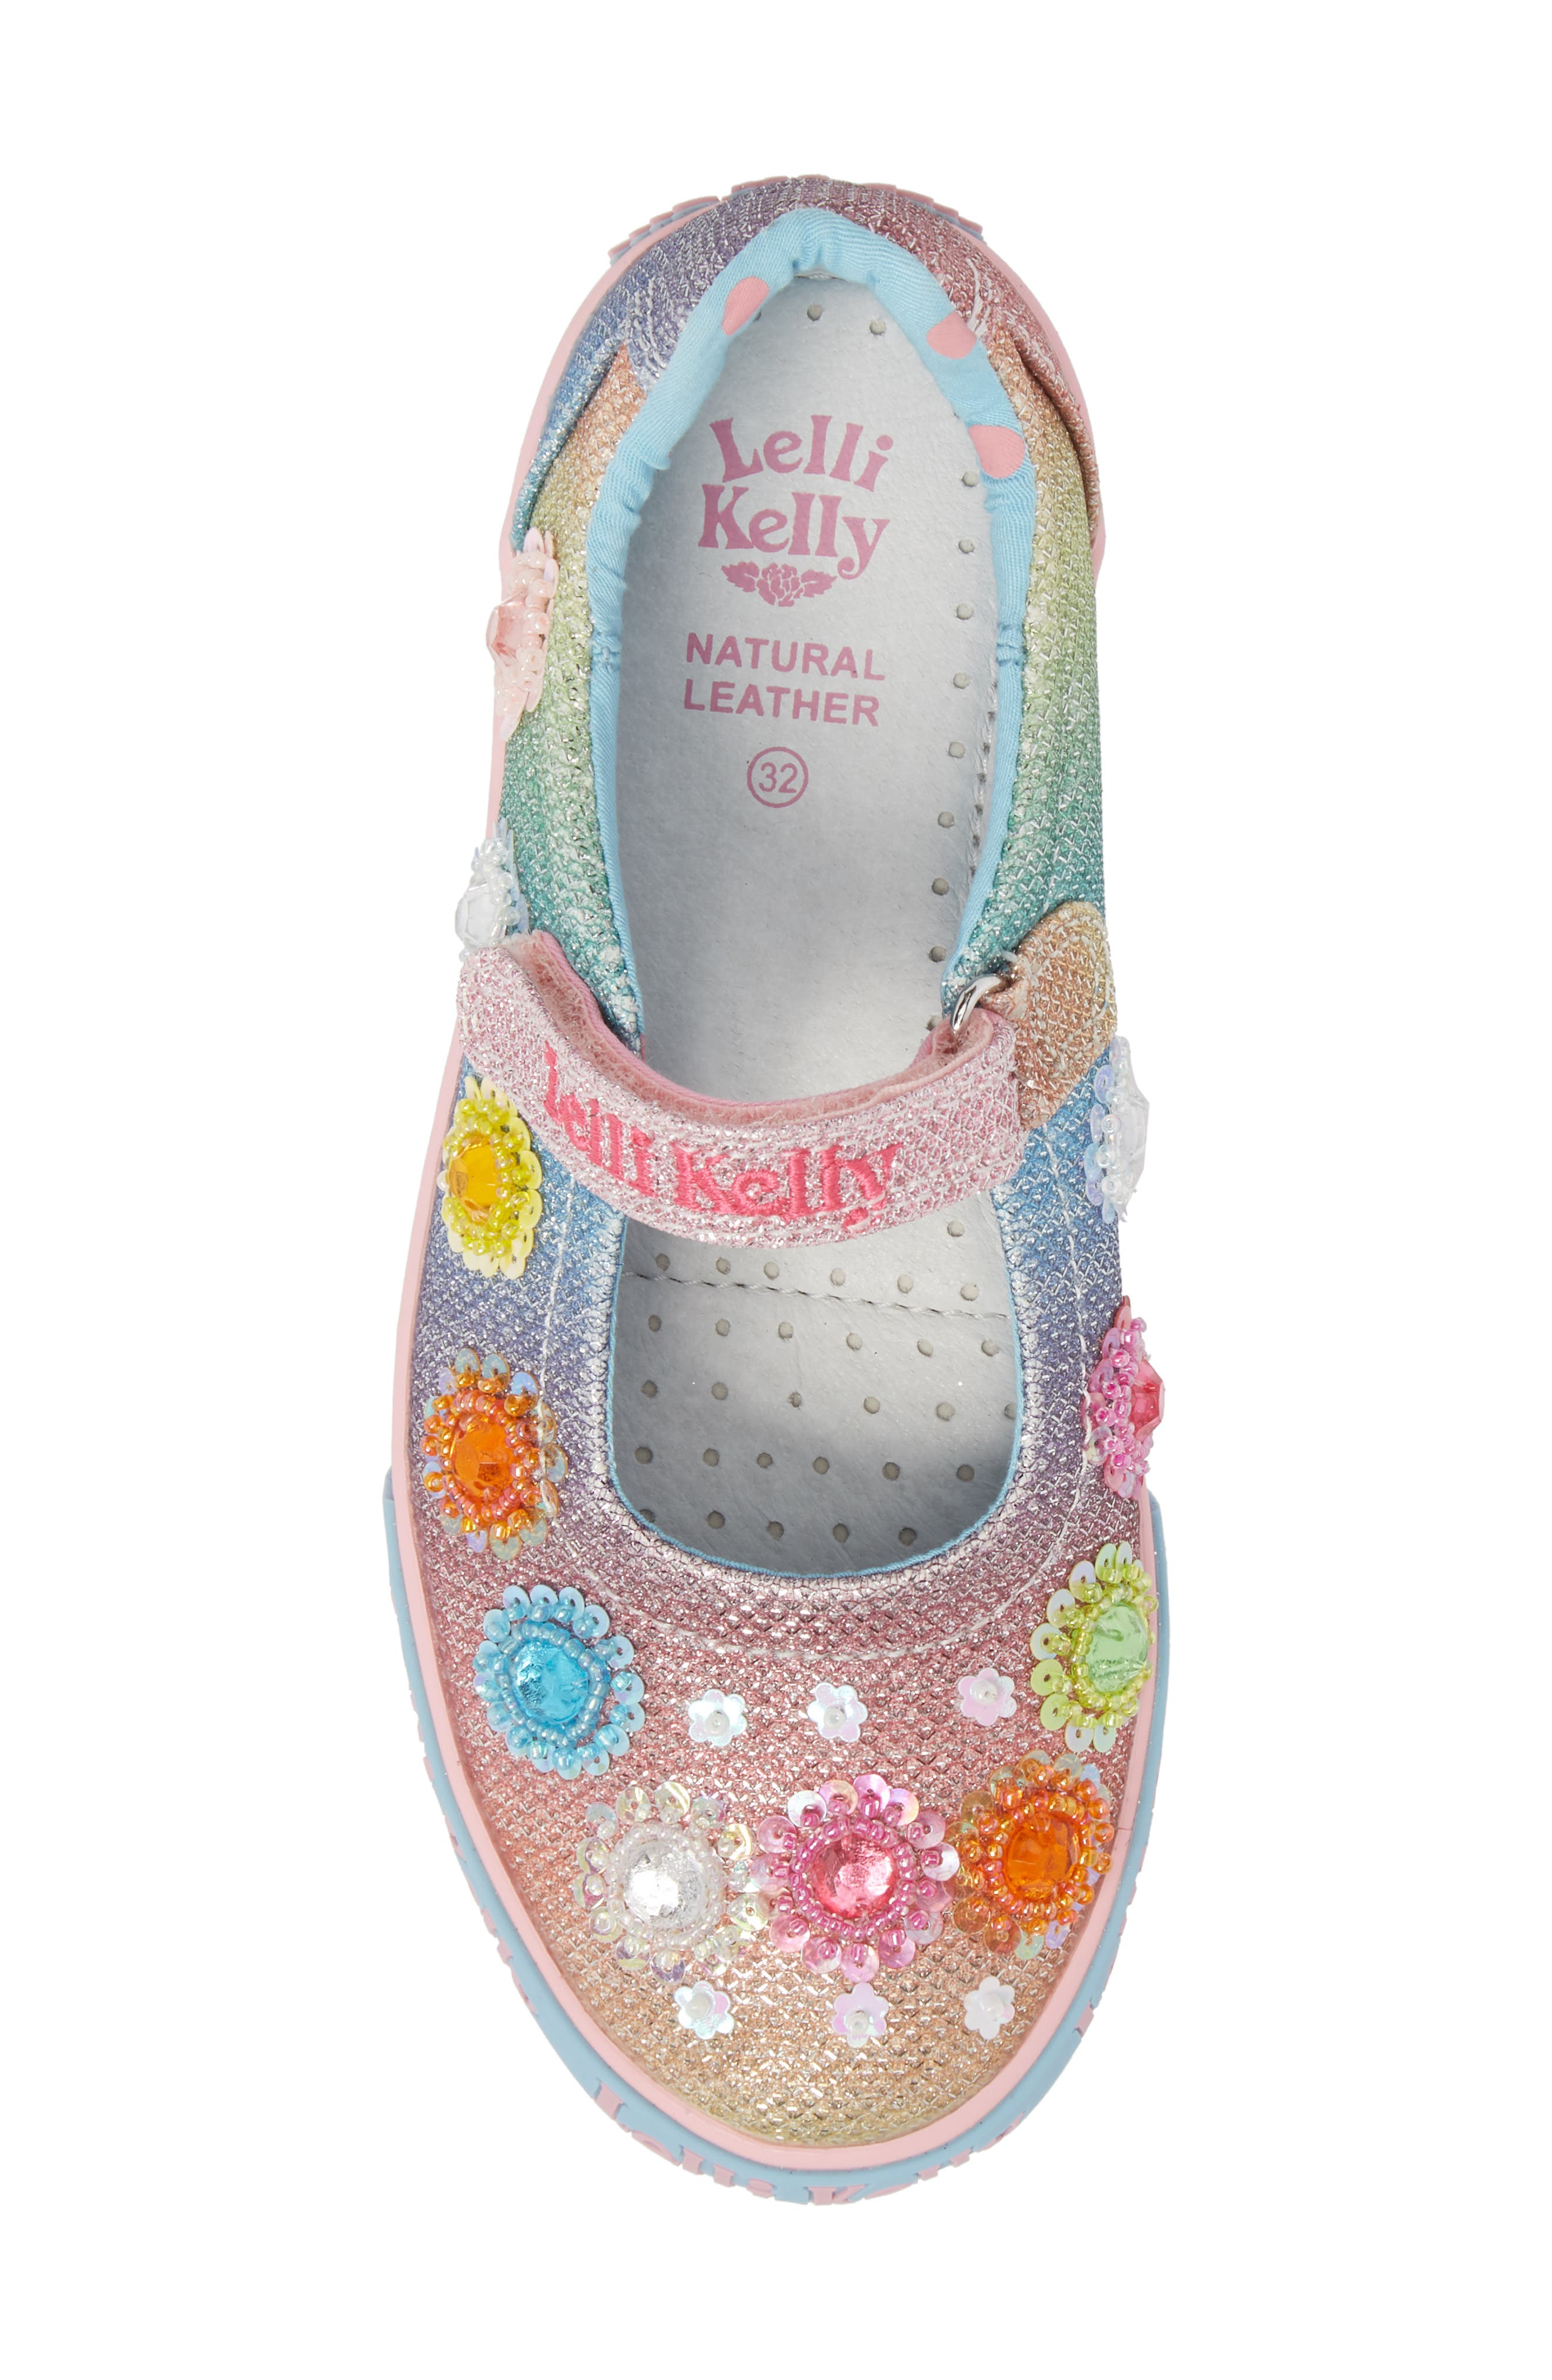 LELLI KELLY, Beaded Mary Jane Sneaker, Alternate thumbnail 5, color, BLUE